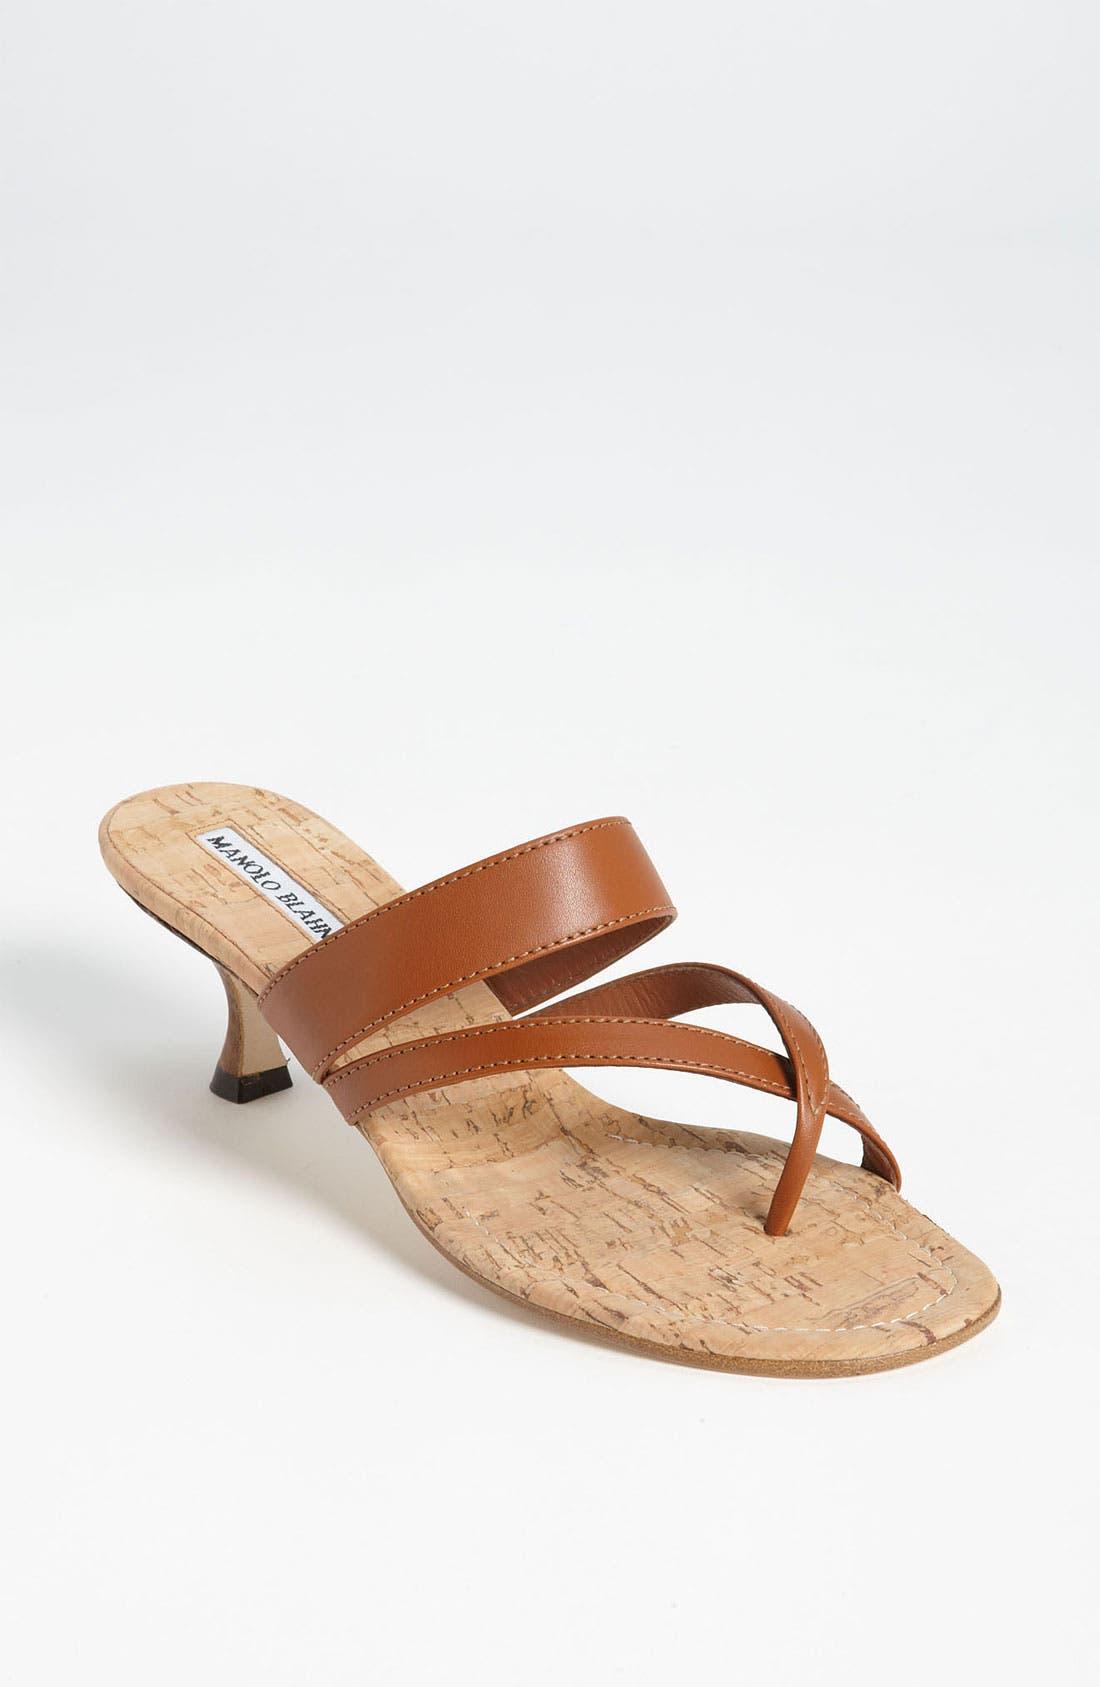 Alternate Image 1 Selected - Manolo Blahnik 'Susa' Sandal